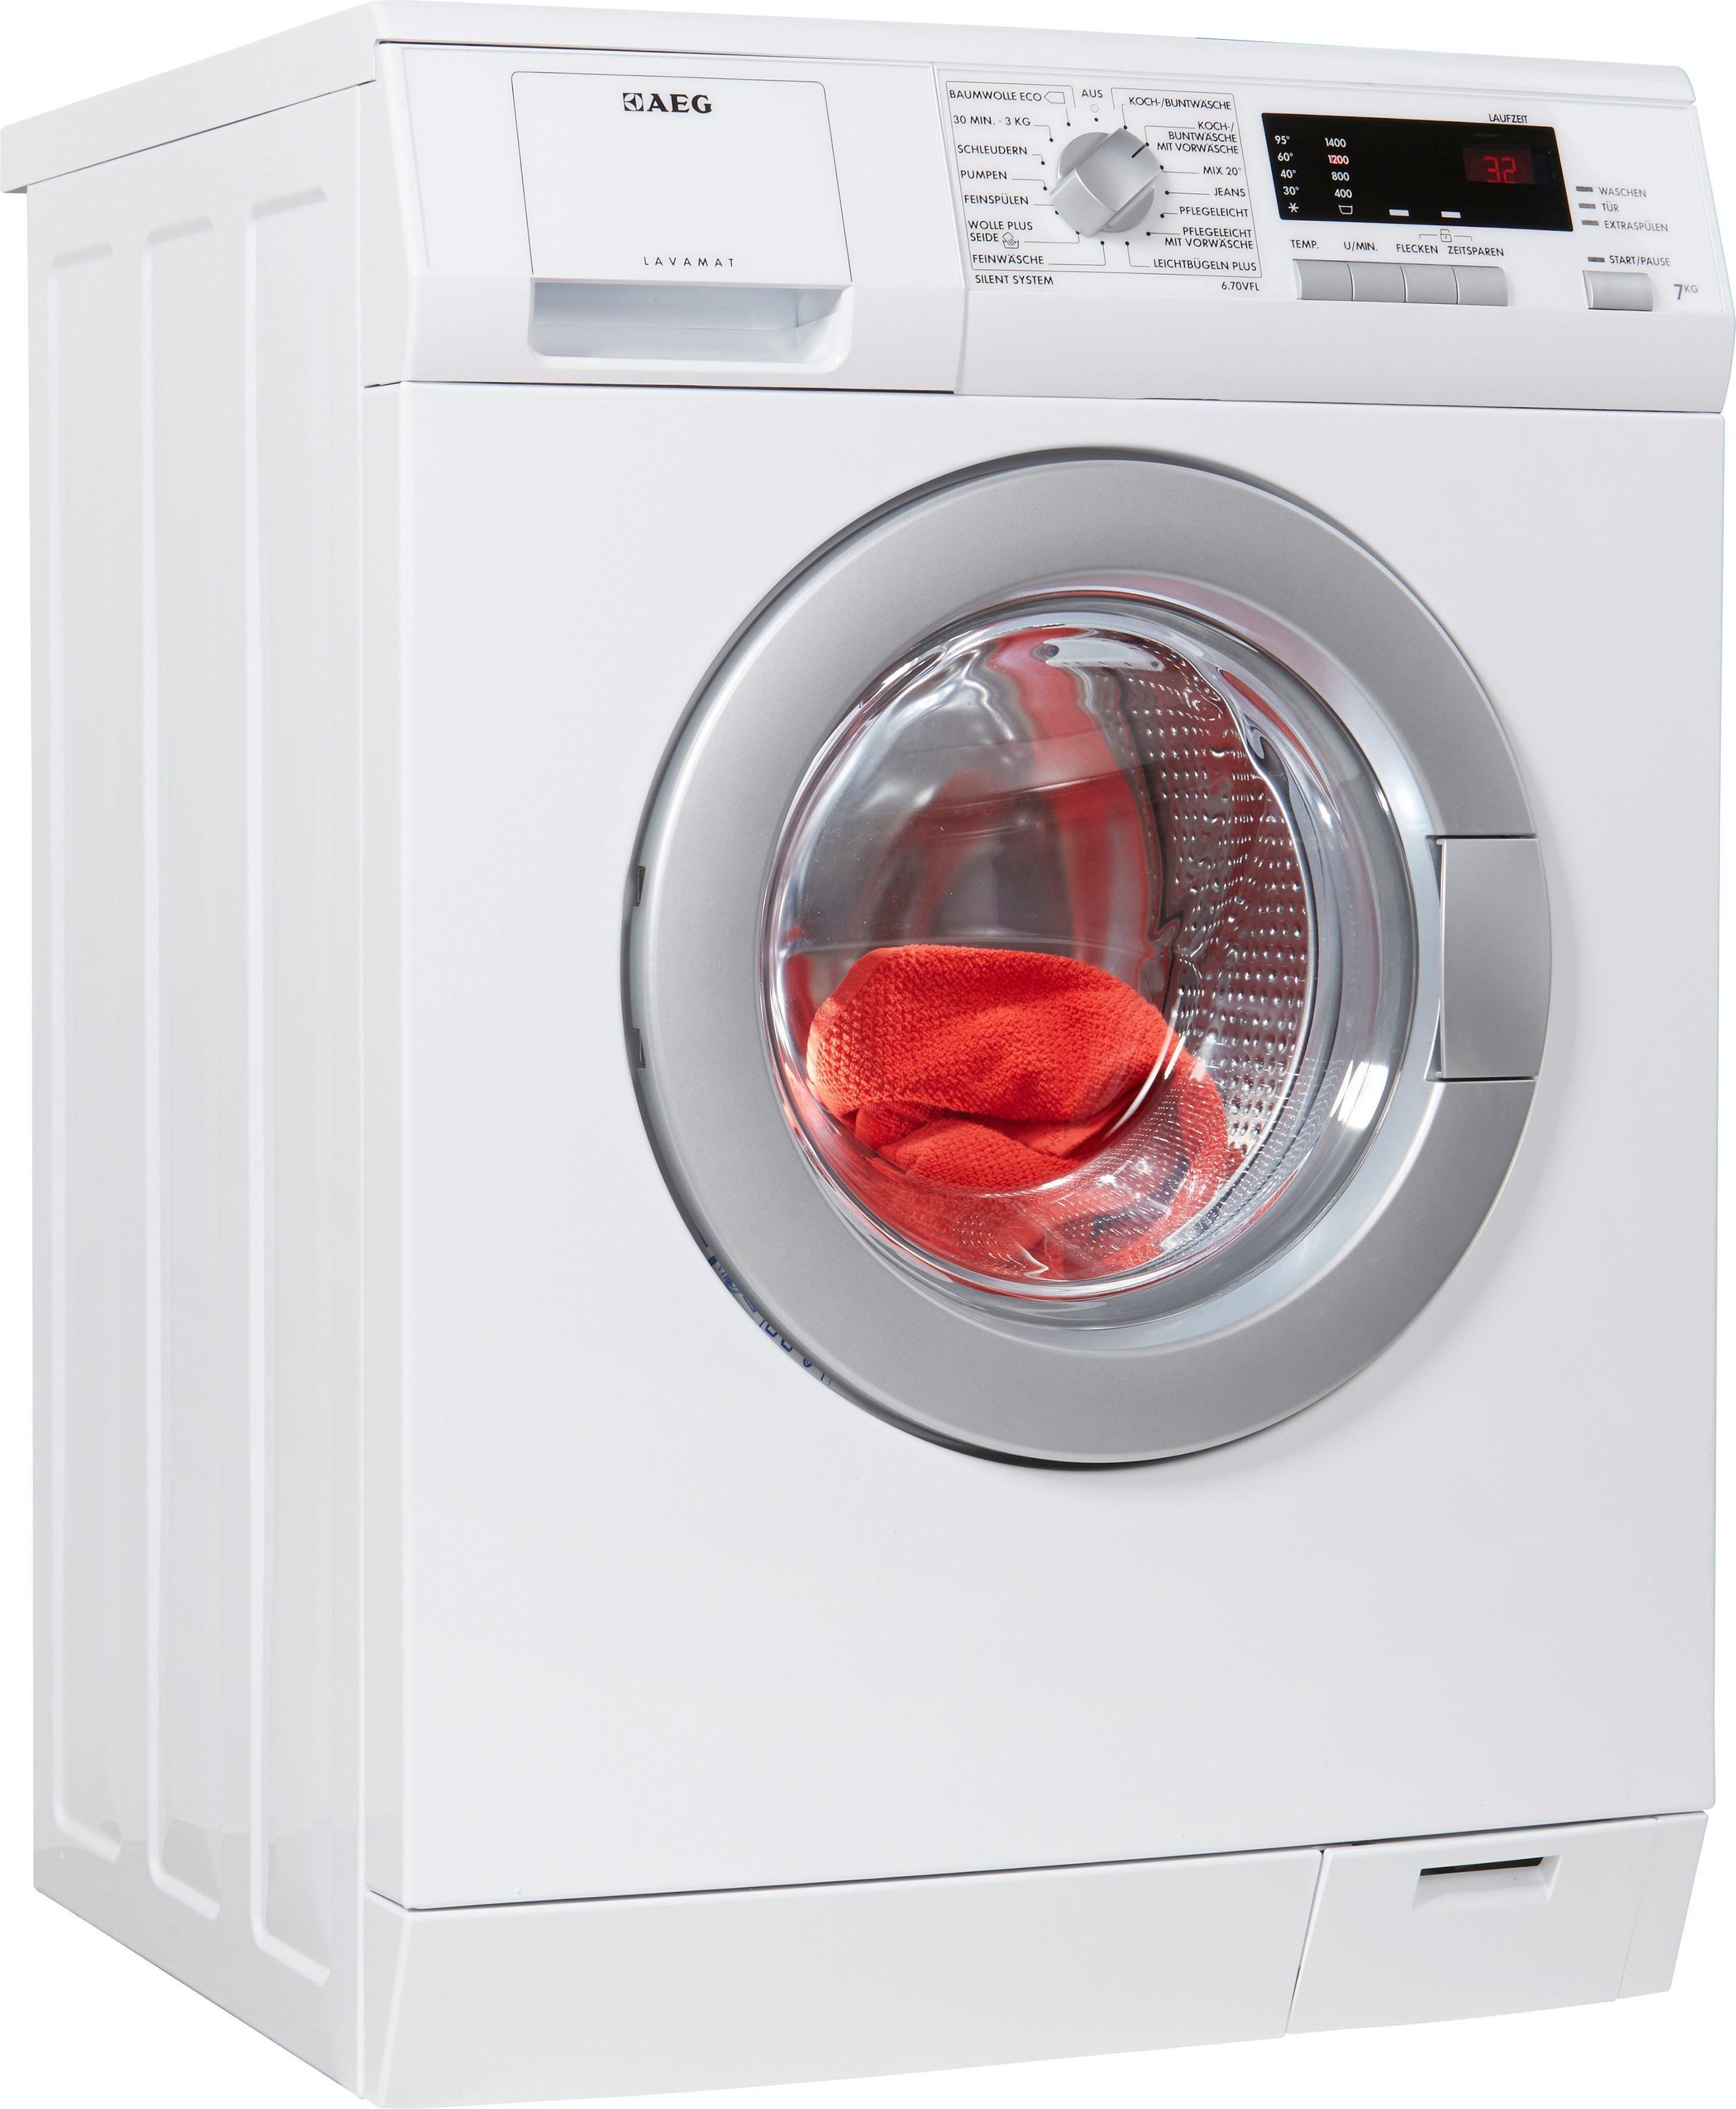 AEG Waschmaschine L6.70VFL, 7 kg, 1400 U/Min